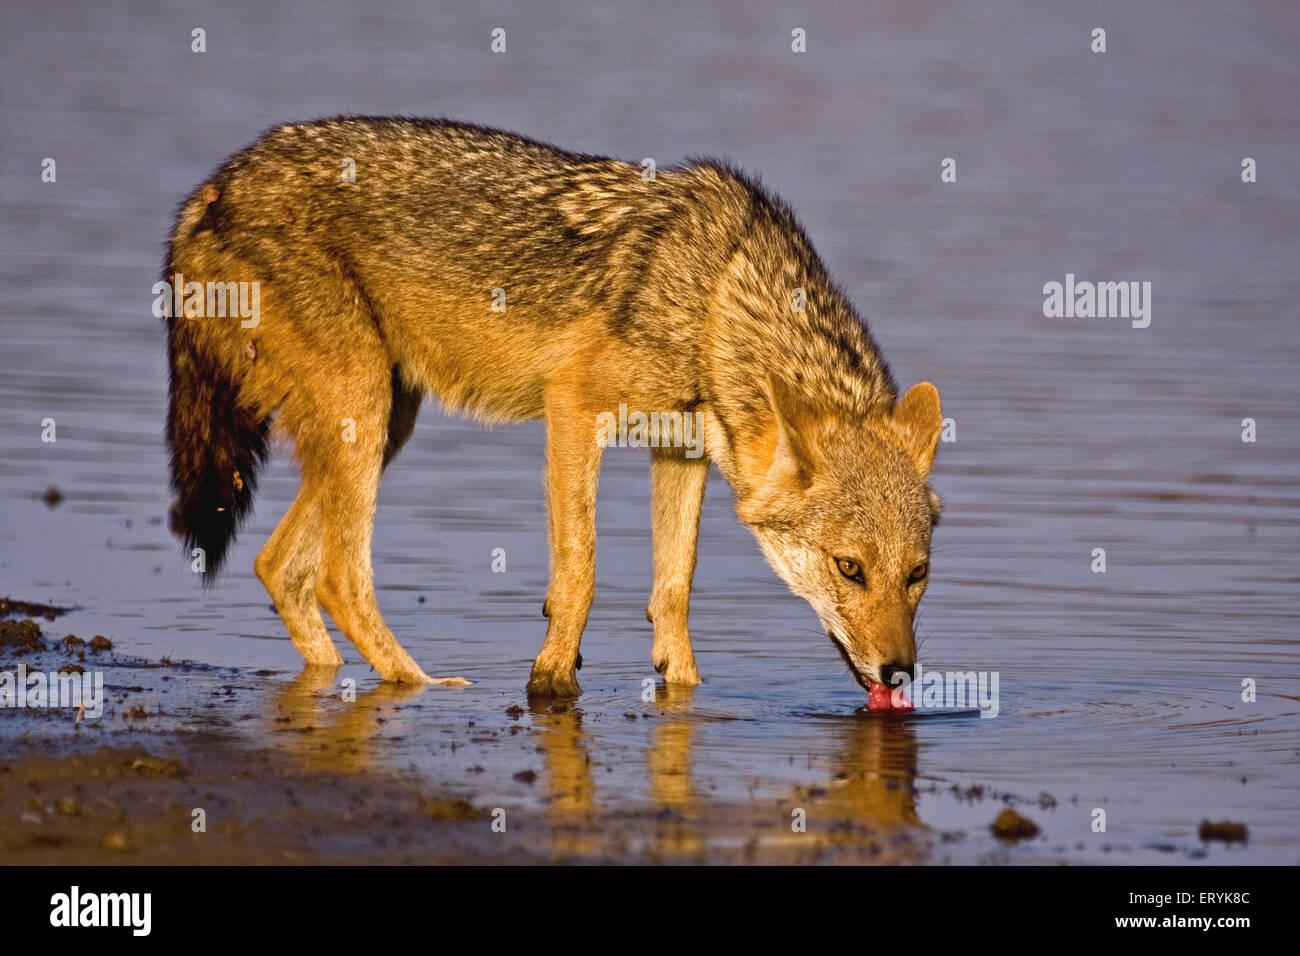 Golden jackal canis aureus drinking water ; Ranthambore national park ; Rajasthan ; India Stock Photo